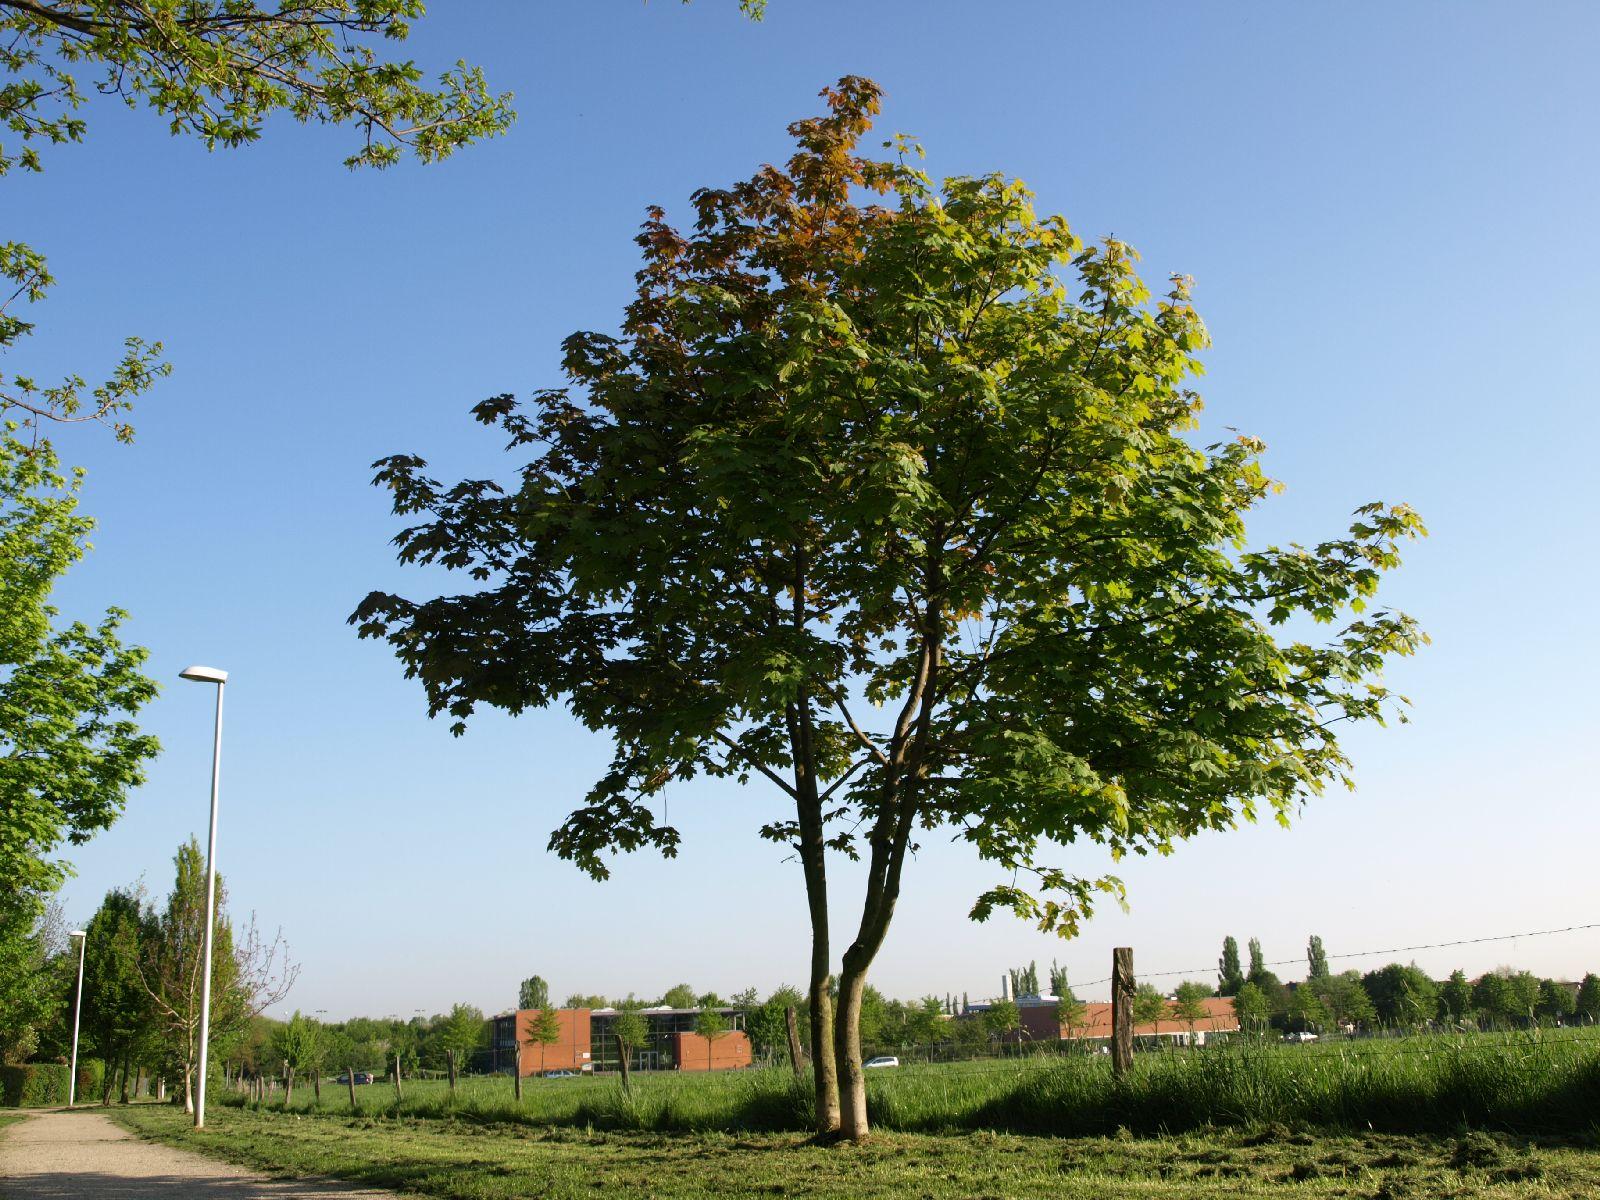 Plants-Trees_Photo_Texture_B_P5072568